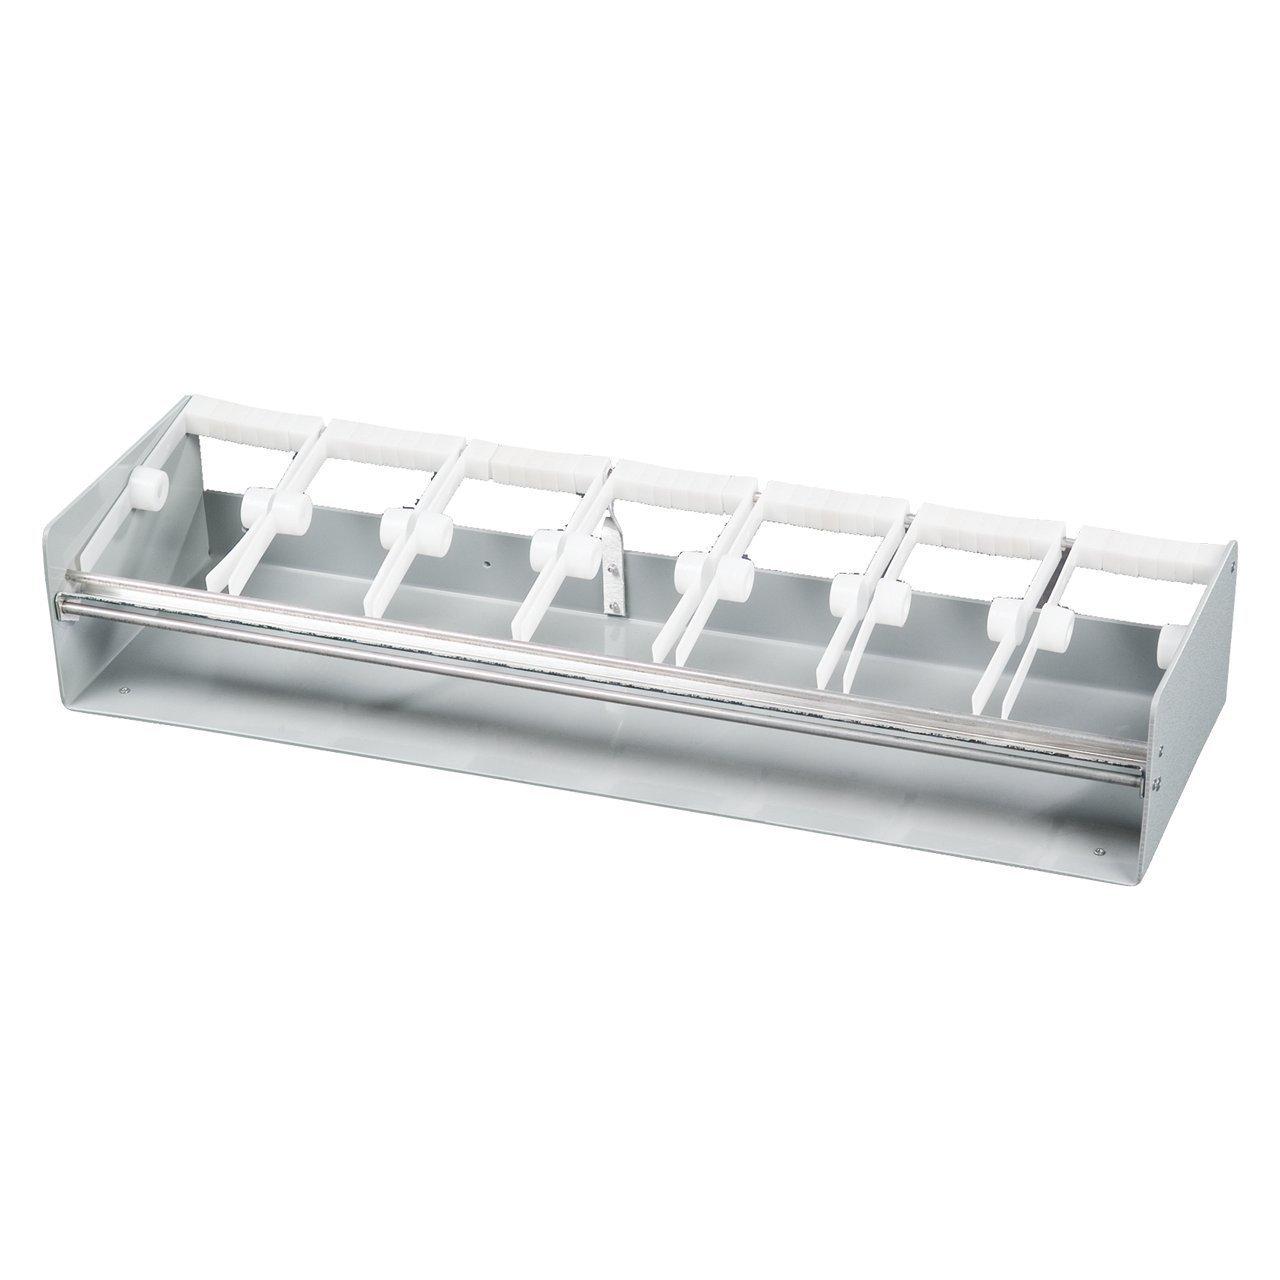 "B009YM6TGO DayMark 7-Slot Plastic Label Dispenser Rack, Holds 7 Rolls of 2"" Wide Labels 61%2BC1IetdSL"